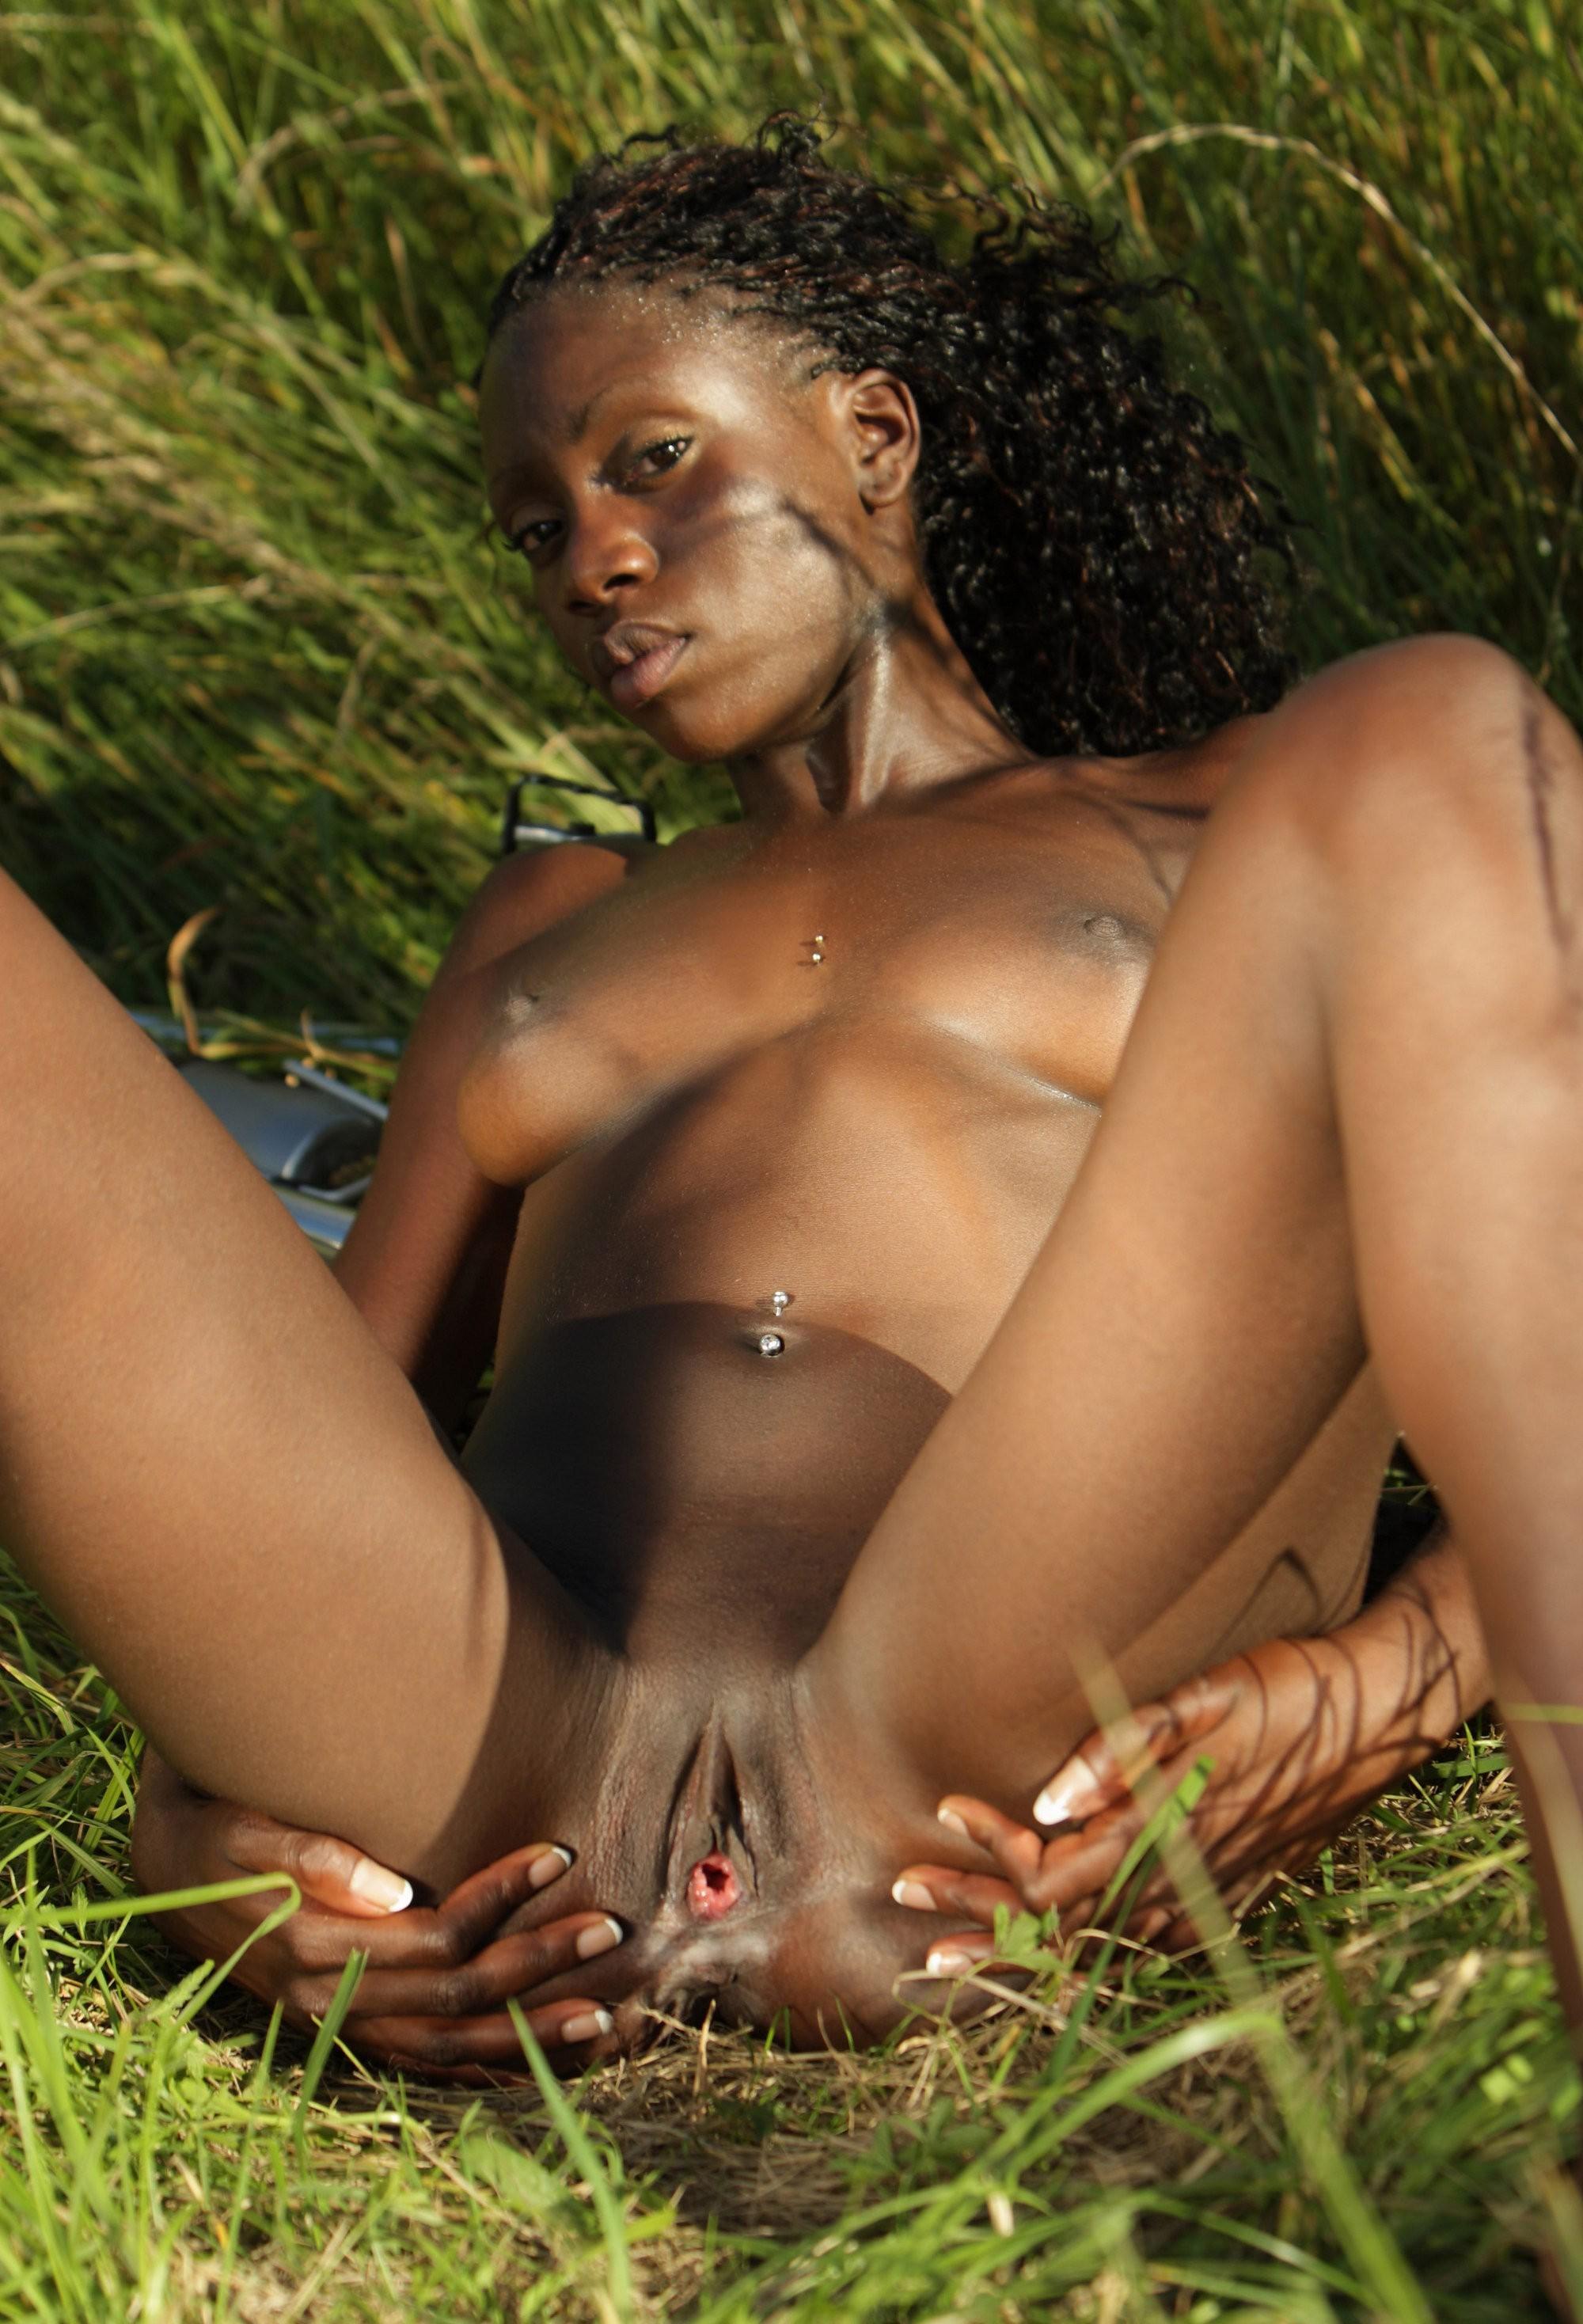 Adriana demeo nackt